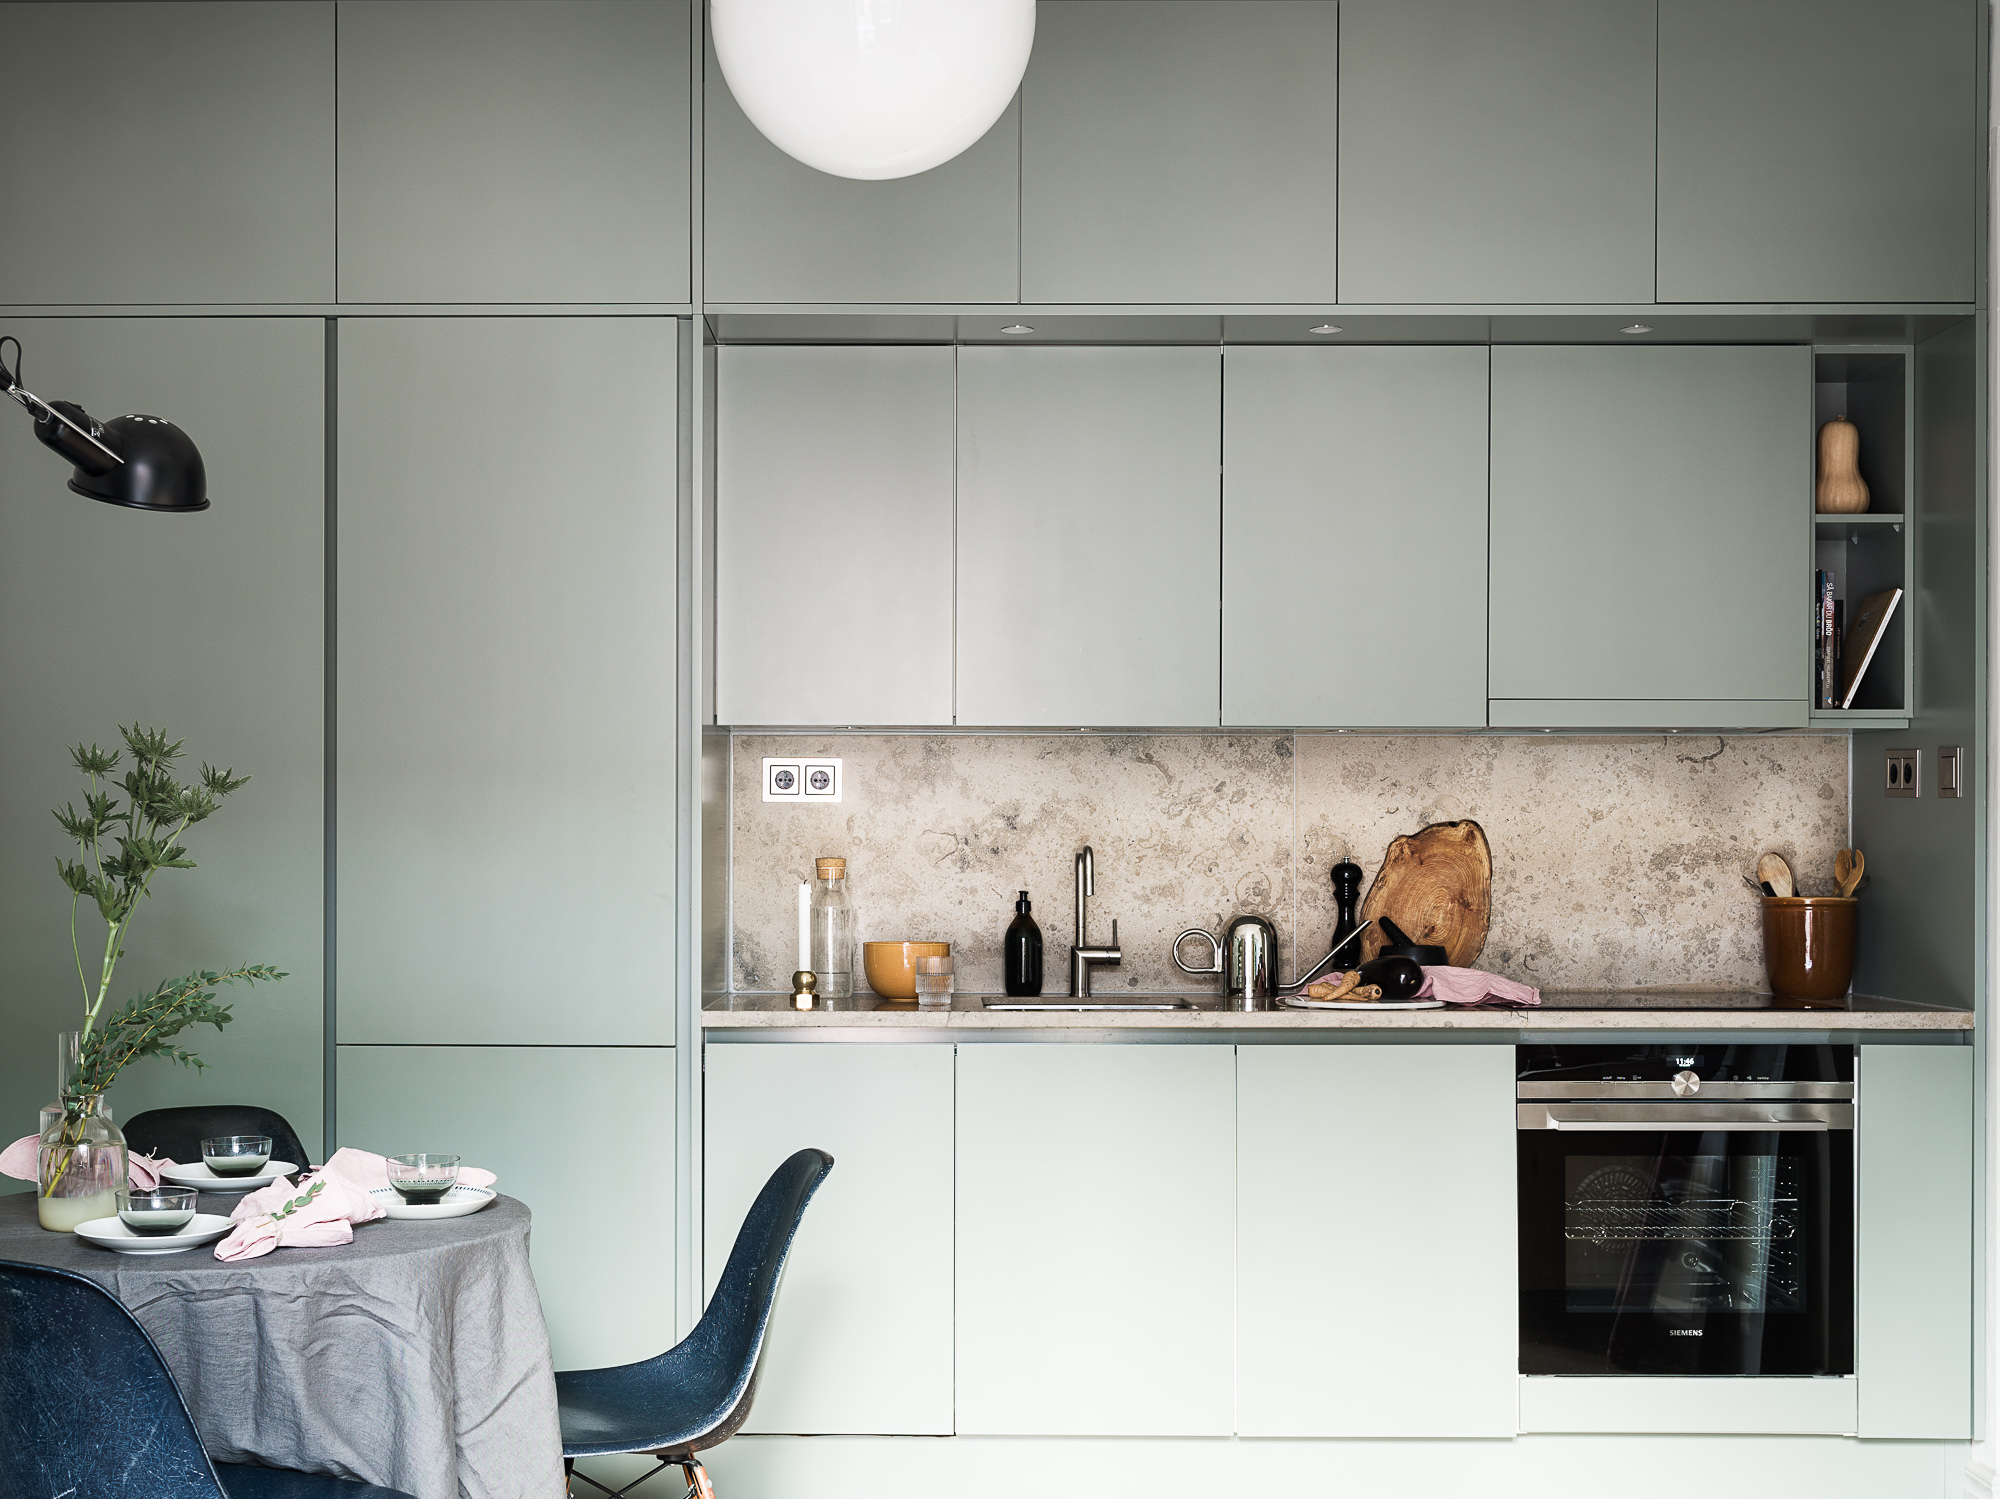 Mint green kitchen and natural stone - COCO LAPINE DESIGNCOCO LAPINE ...